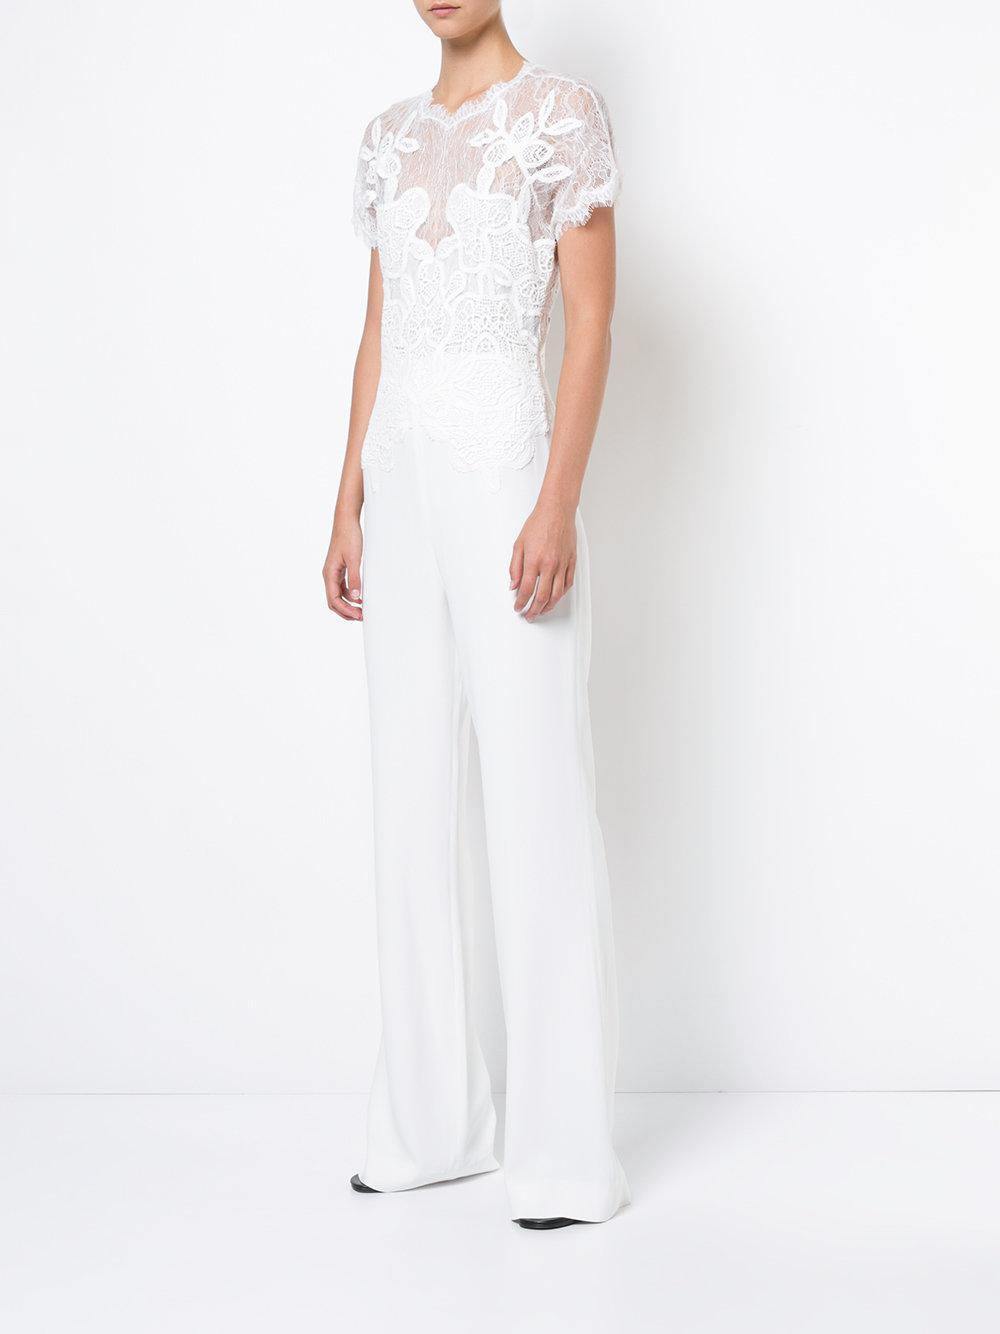 3028506f55de Lyst - Jonathan Simkhai Lace Bodice Jumpsuit in White